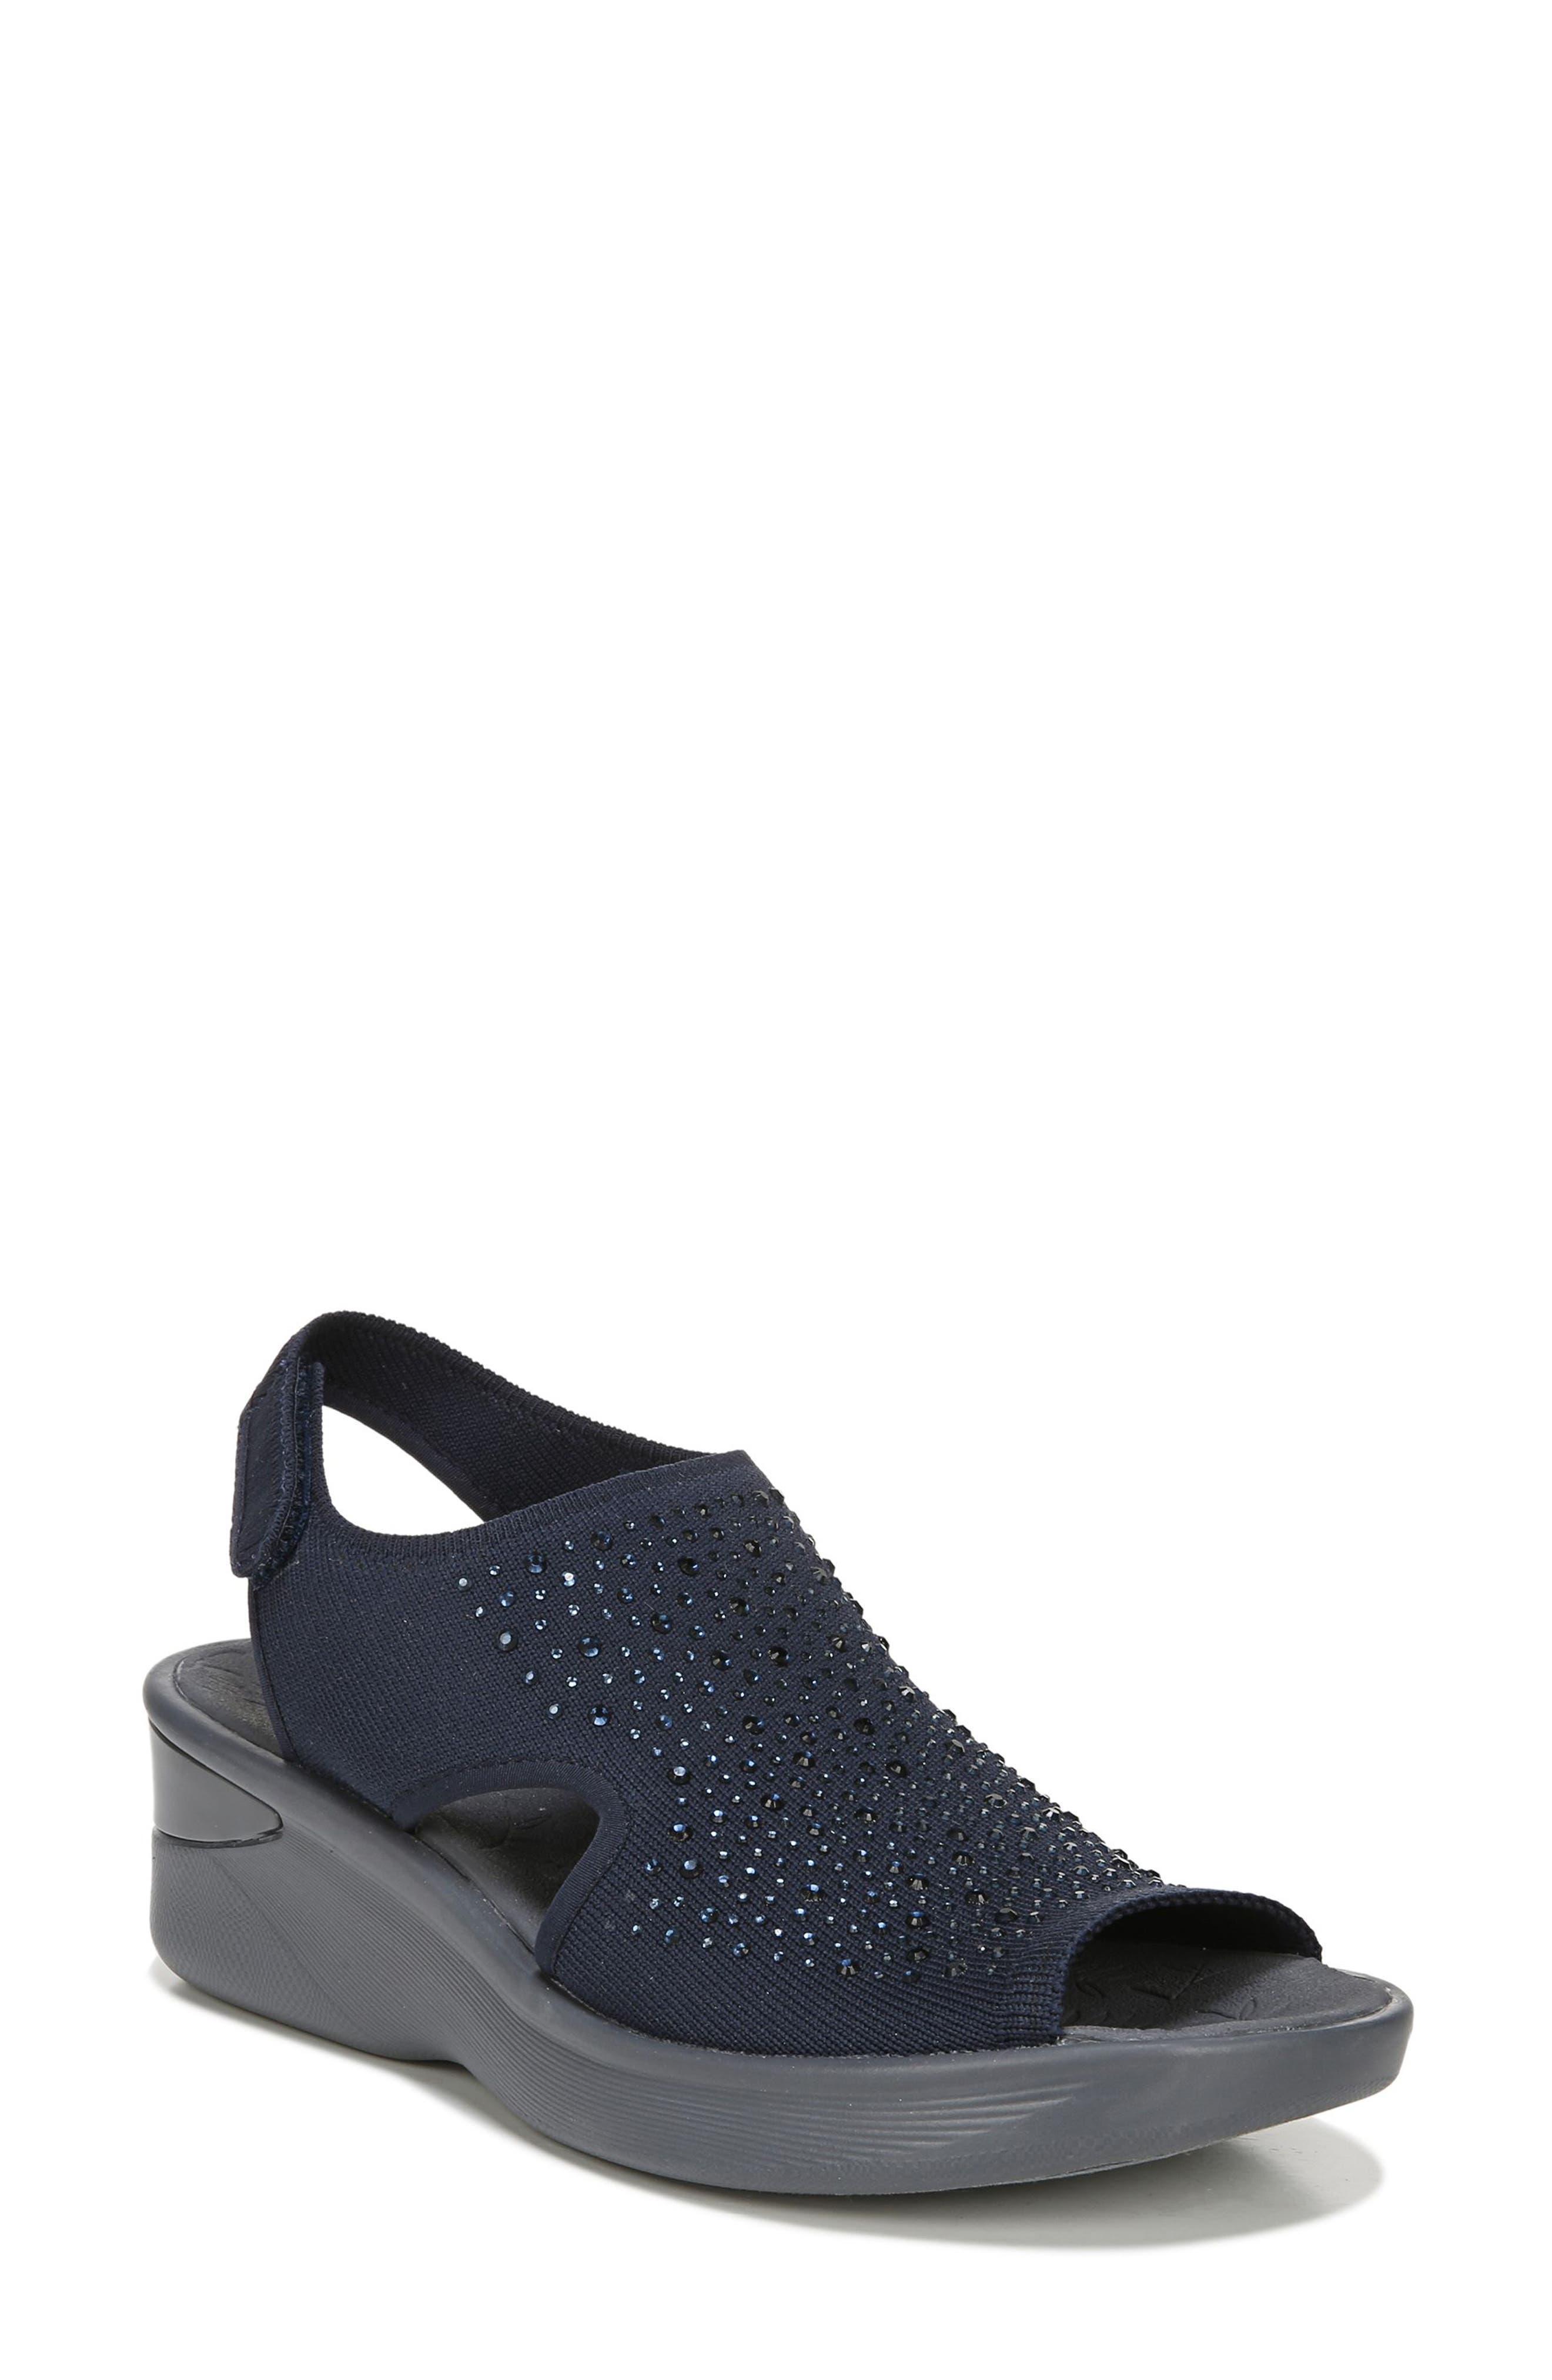 Saucy Slingback Sandal